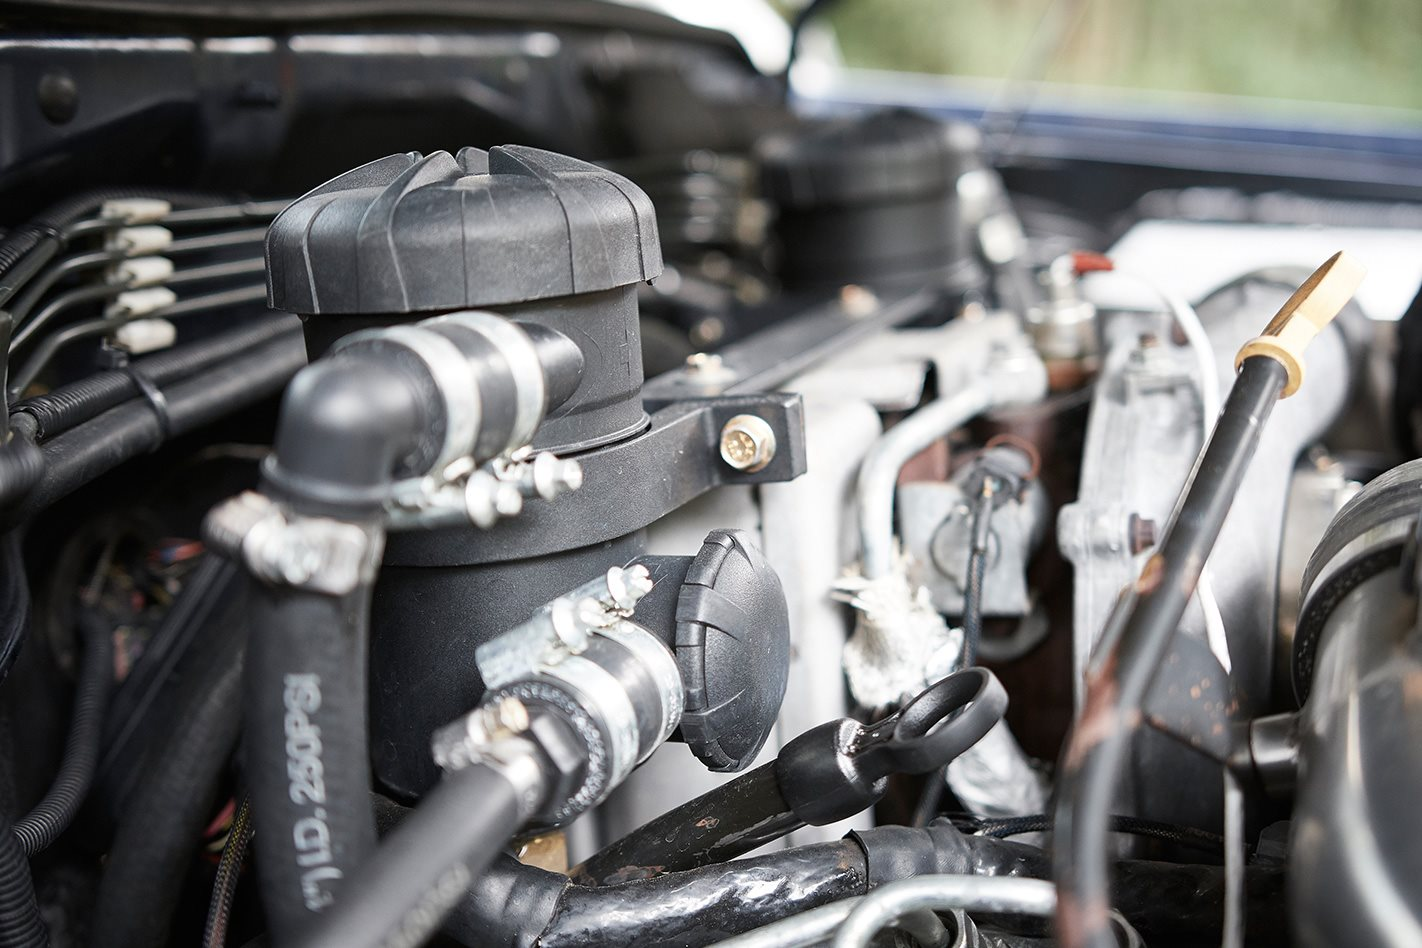 Duramax-V8-Nissan-GU-Patrol-engine.jpg